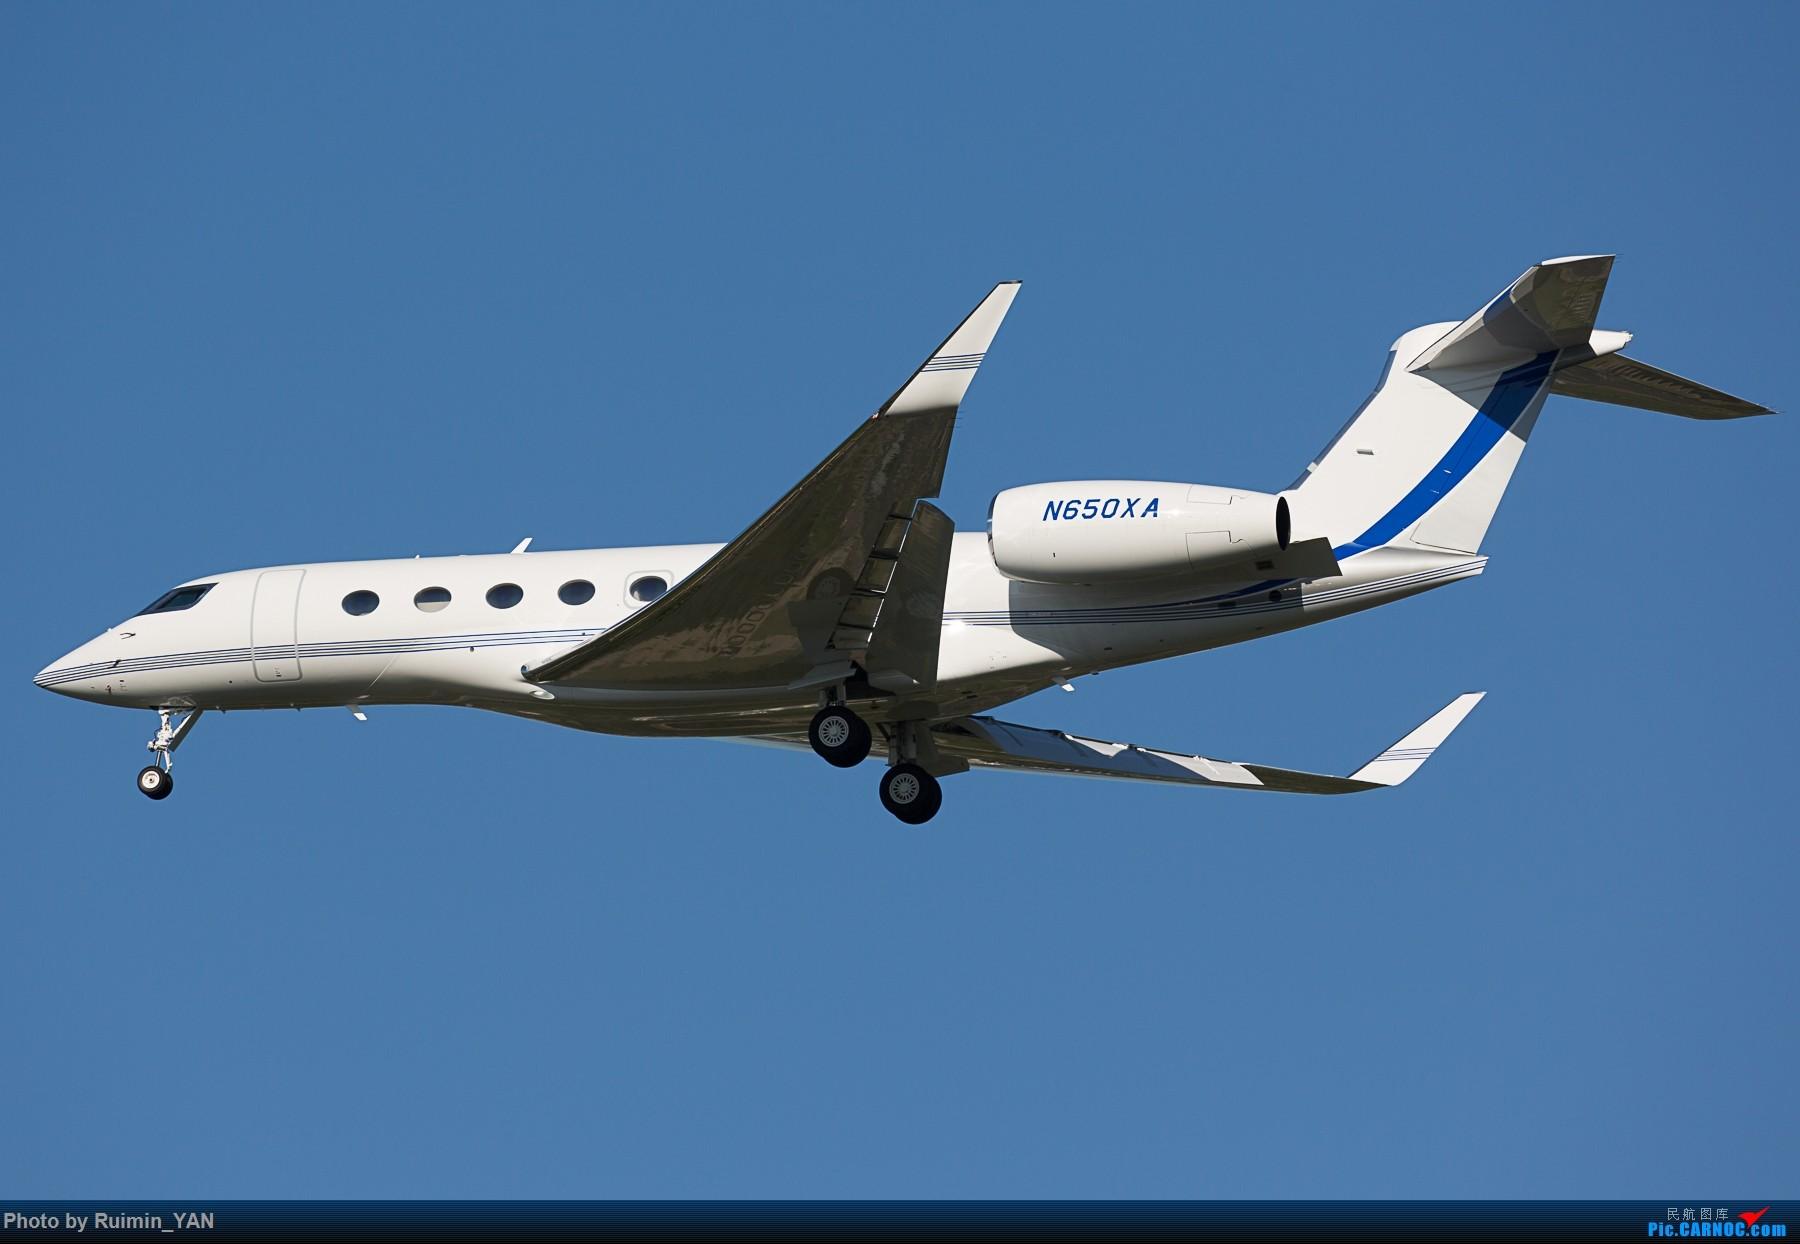 Re:【PEK】【公务机】阿拉伯-美国石油公司(Saudi Aramco Aviation) N650XA,湾流Gulfstream G650 GULFSTREAM G650 N650XA 中国北京首都国际机场